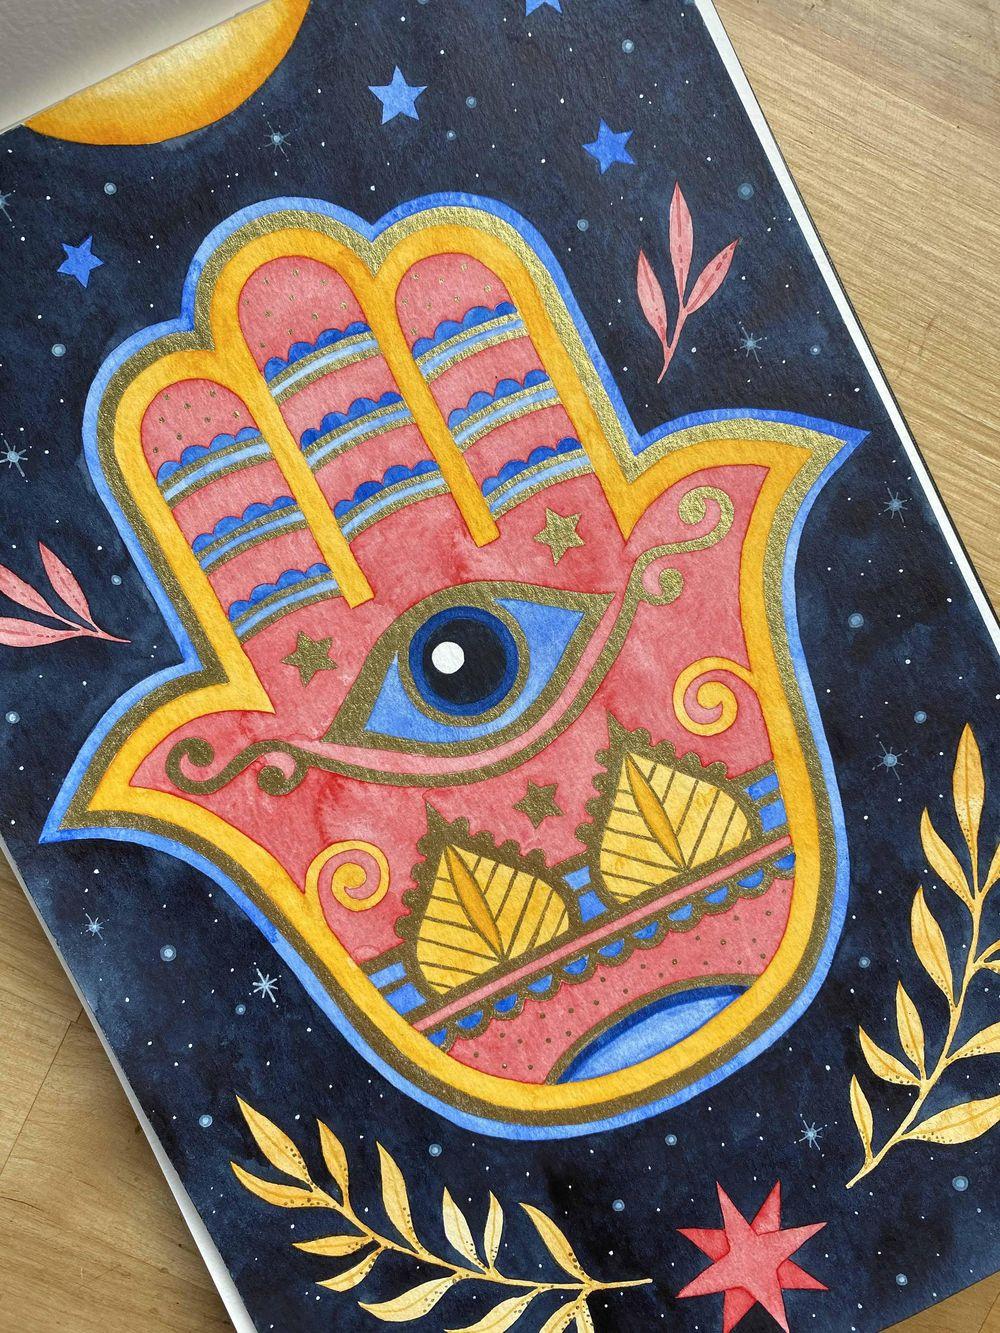 Hamsa Hand - image 2 - student project